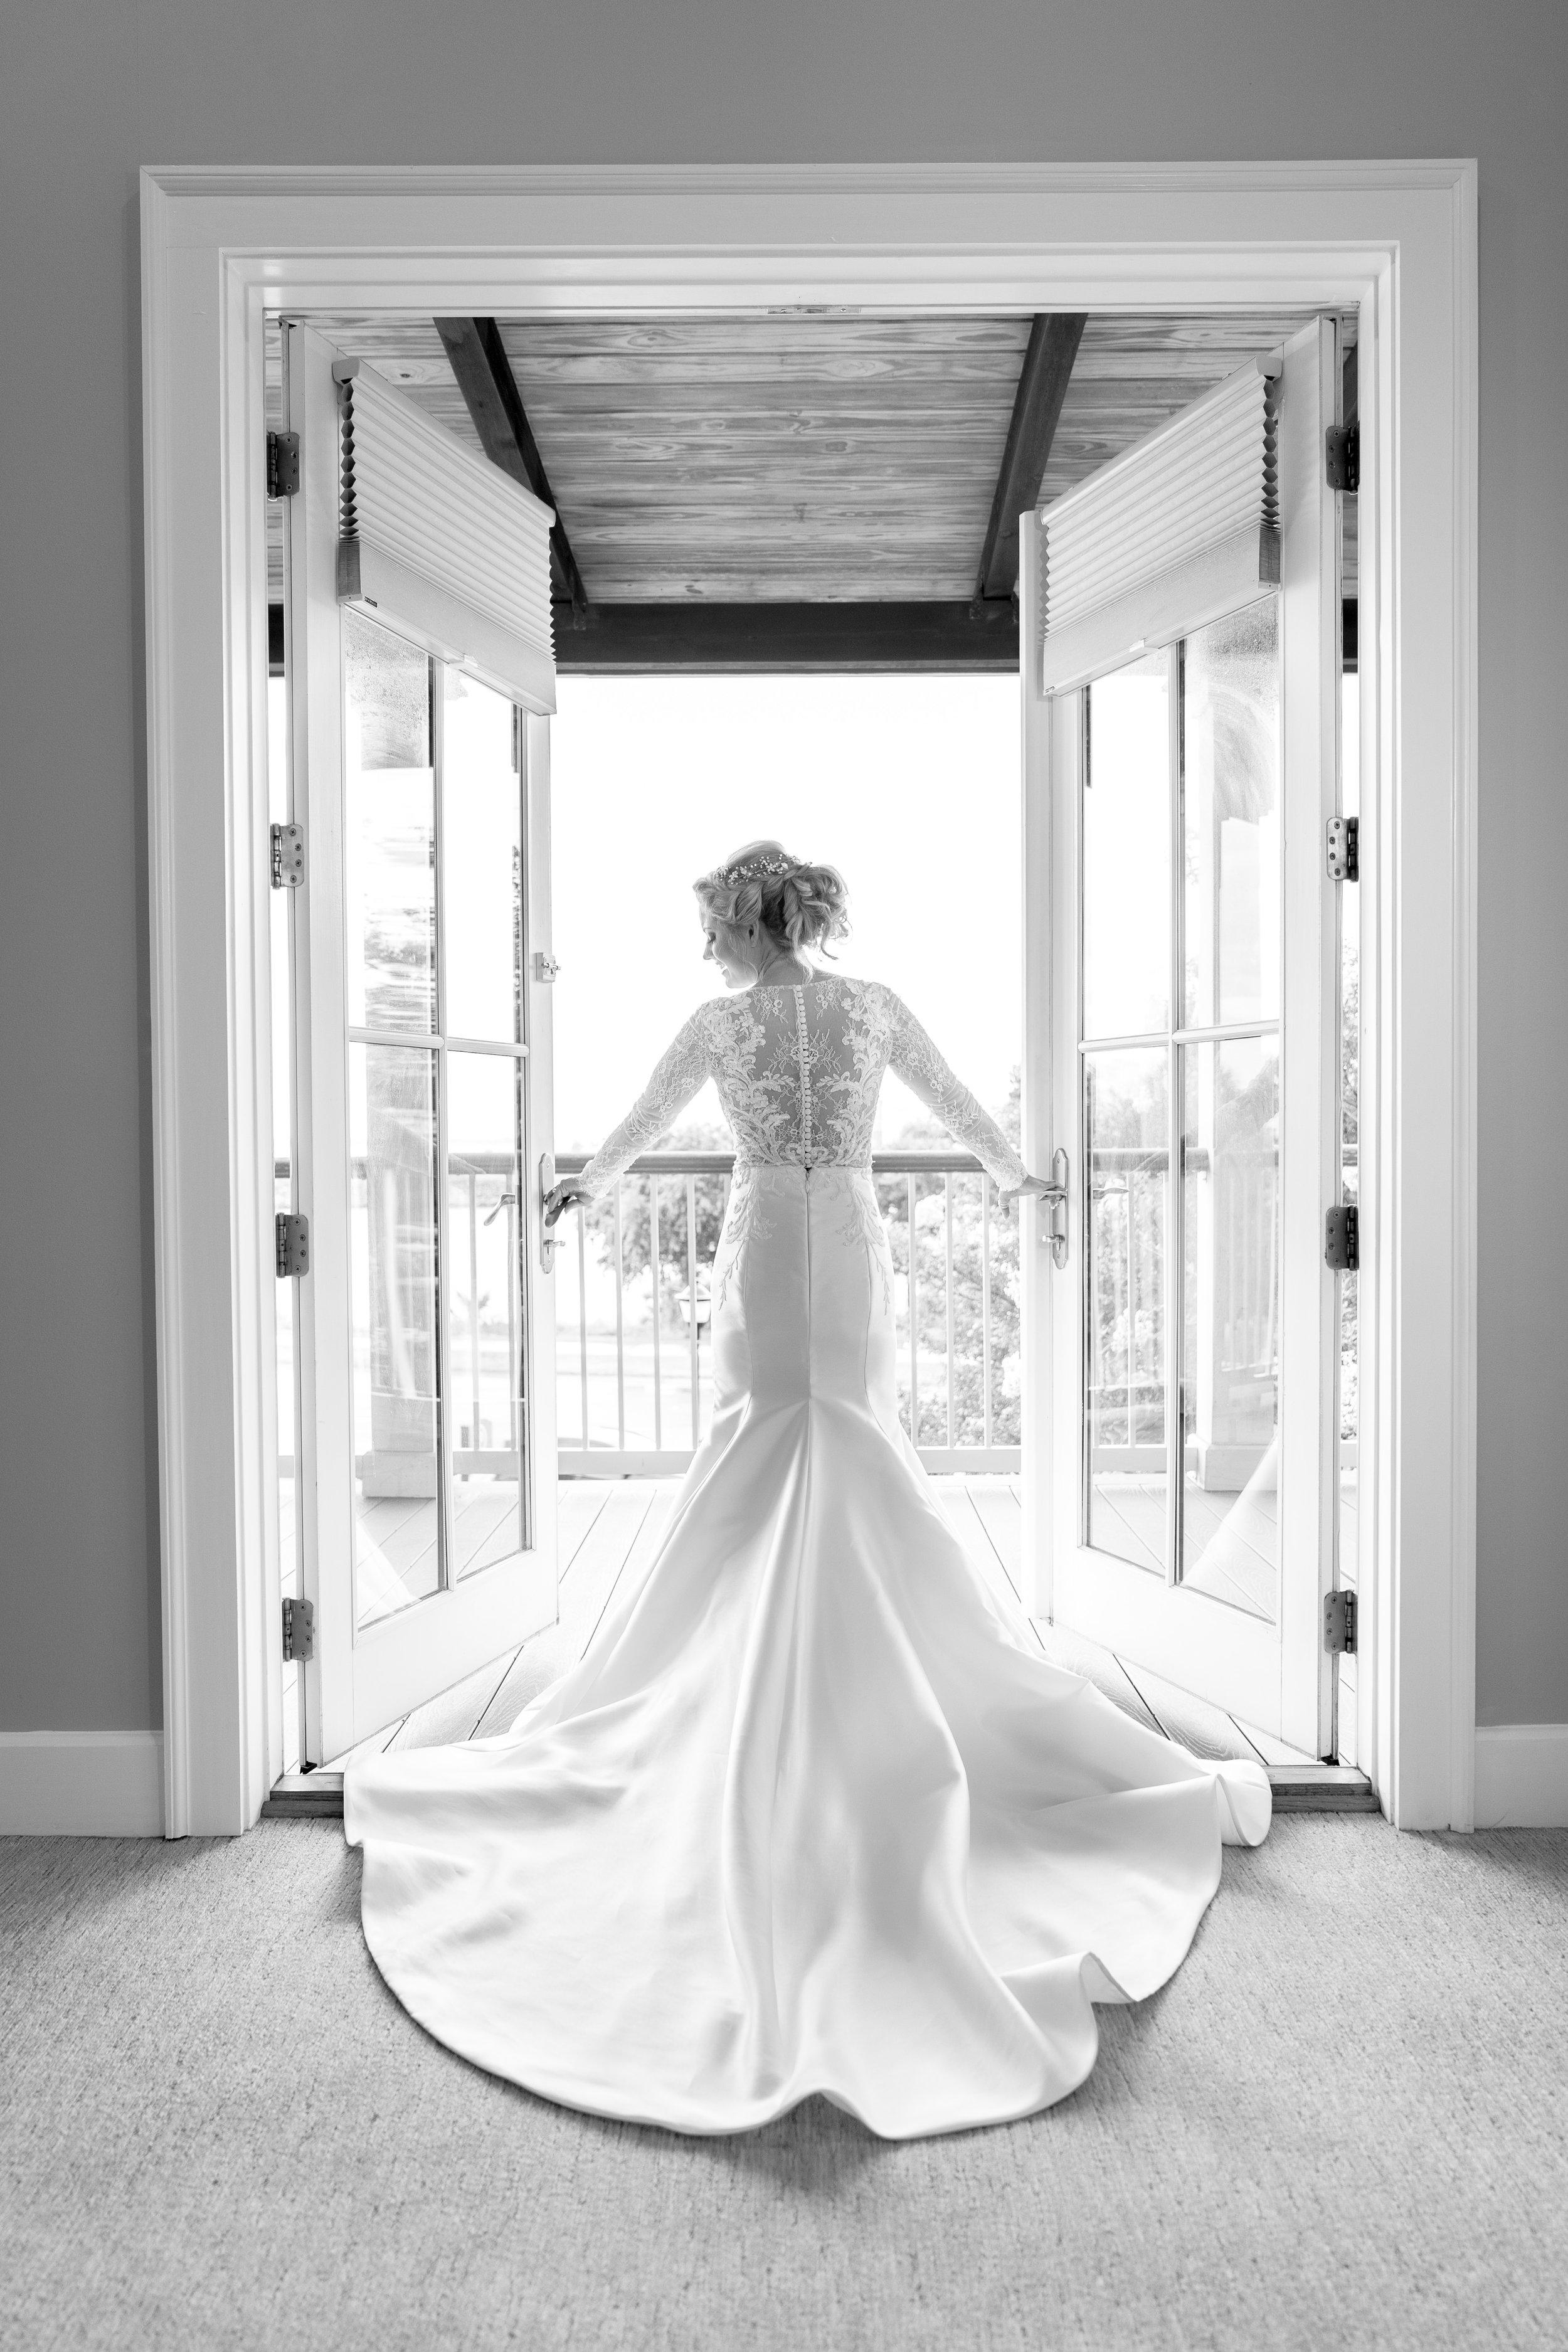 bridal-wedding-dress-photography-ideas.jpg